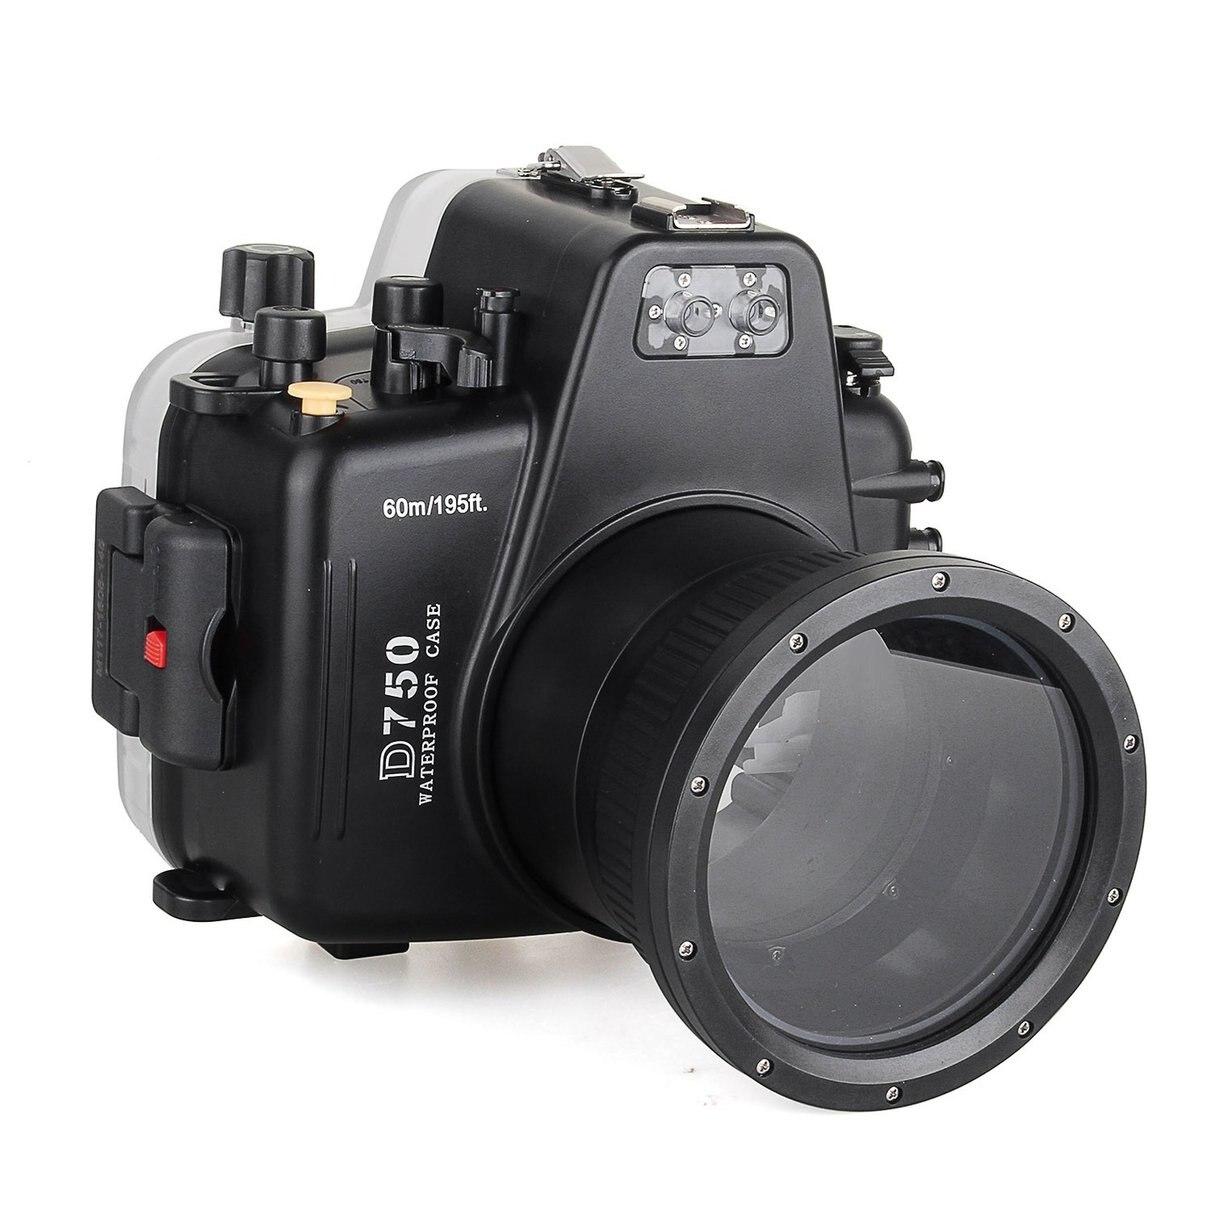 Meikon 60m/195ft for Nikon D750 Waterproof Underwater Camera Housing Case Diving Equipment